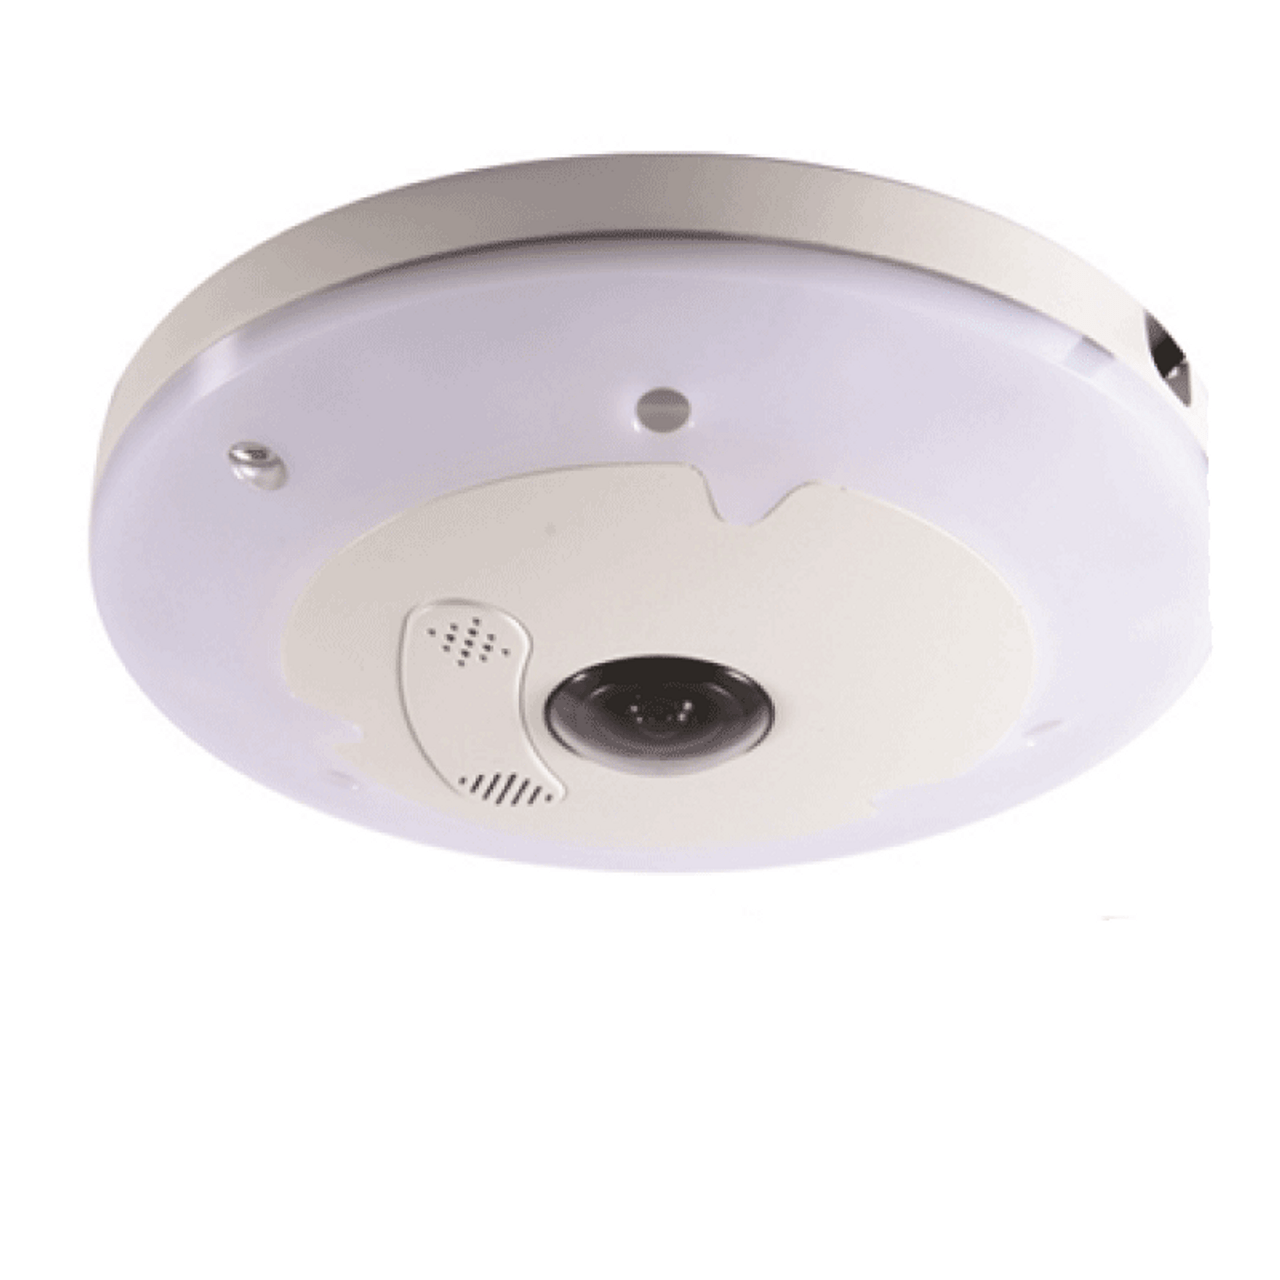 Geovision GV-FE3403 3MP Fisheye 360-degree Indoor IR Dome IP Security Camera